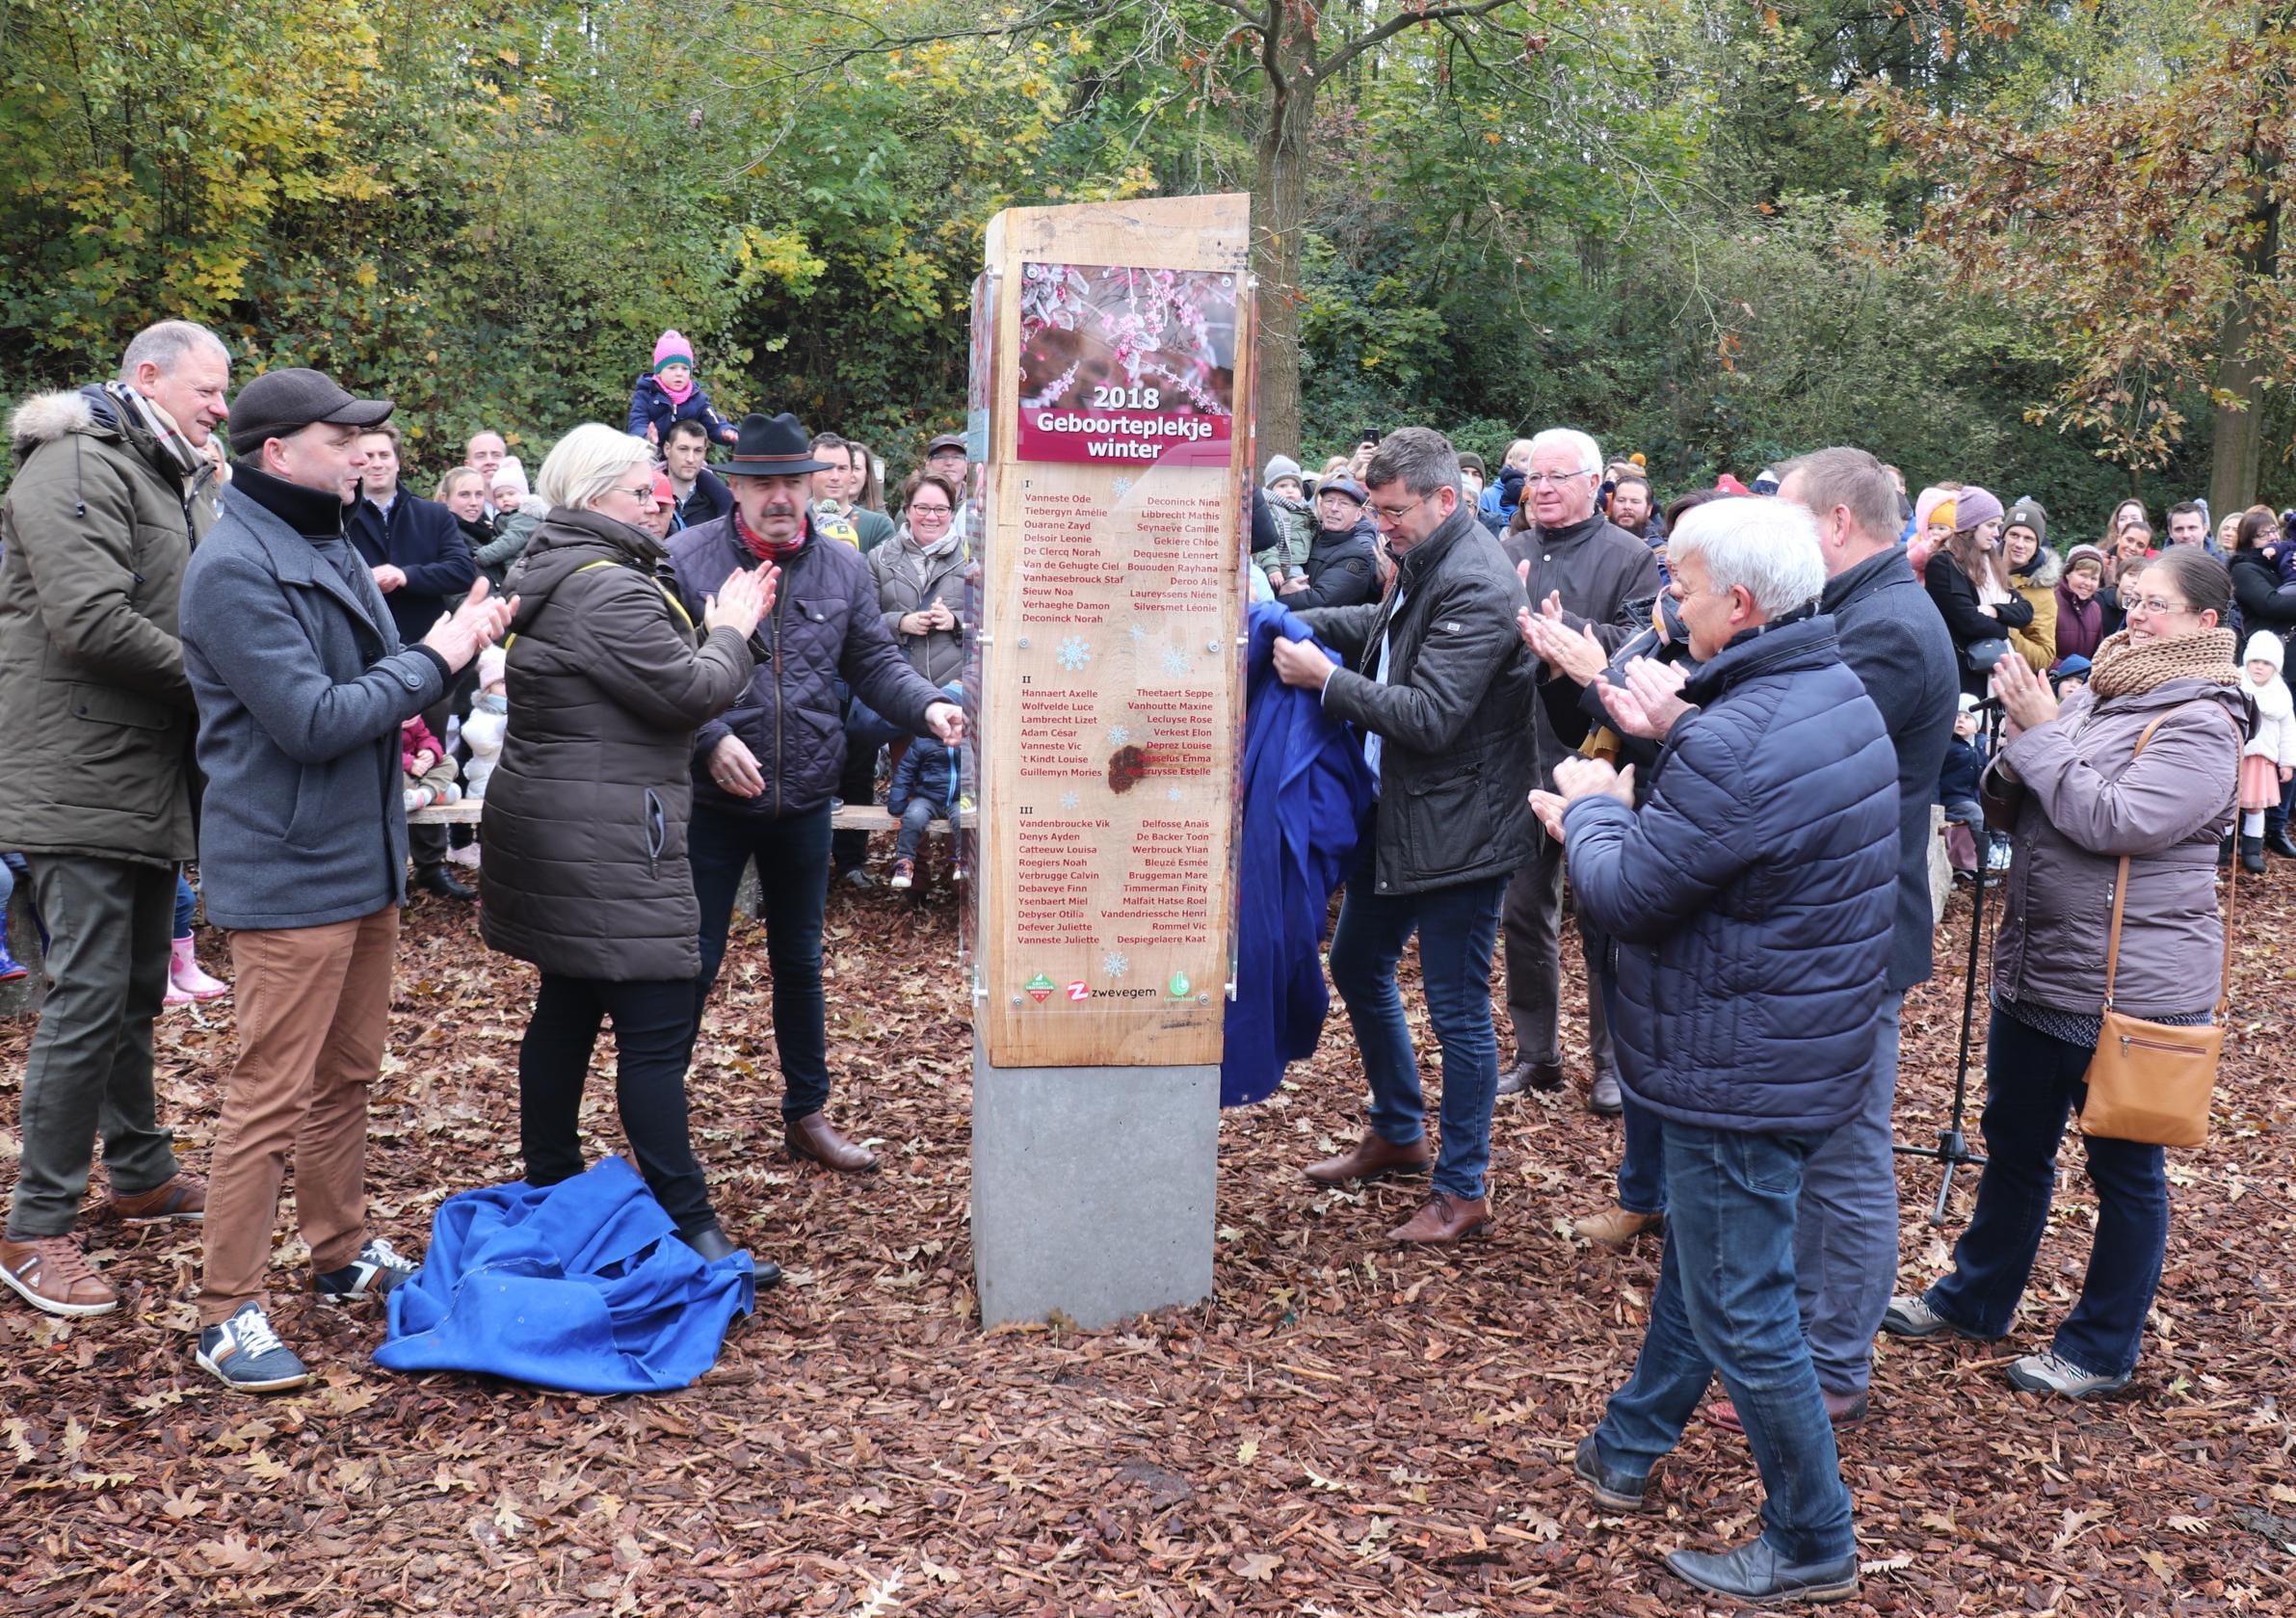 Vierde geboorteplekje van groot-Zwevegem in Oliebergpark ingewijd - De Standaard